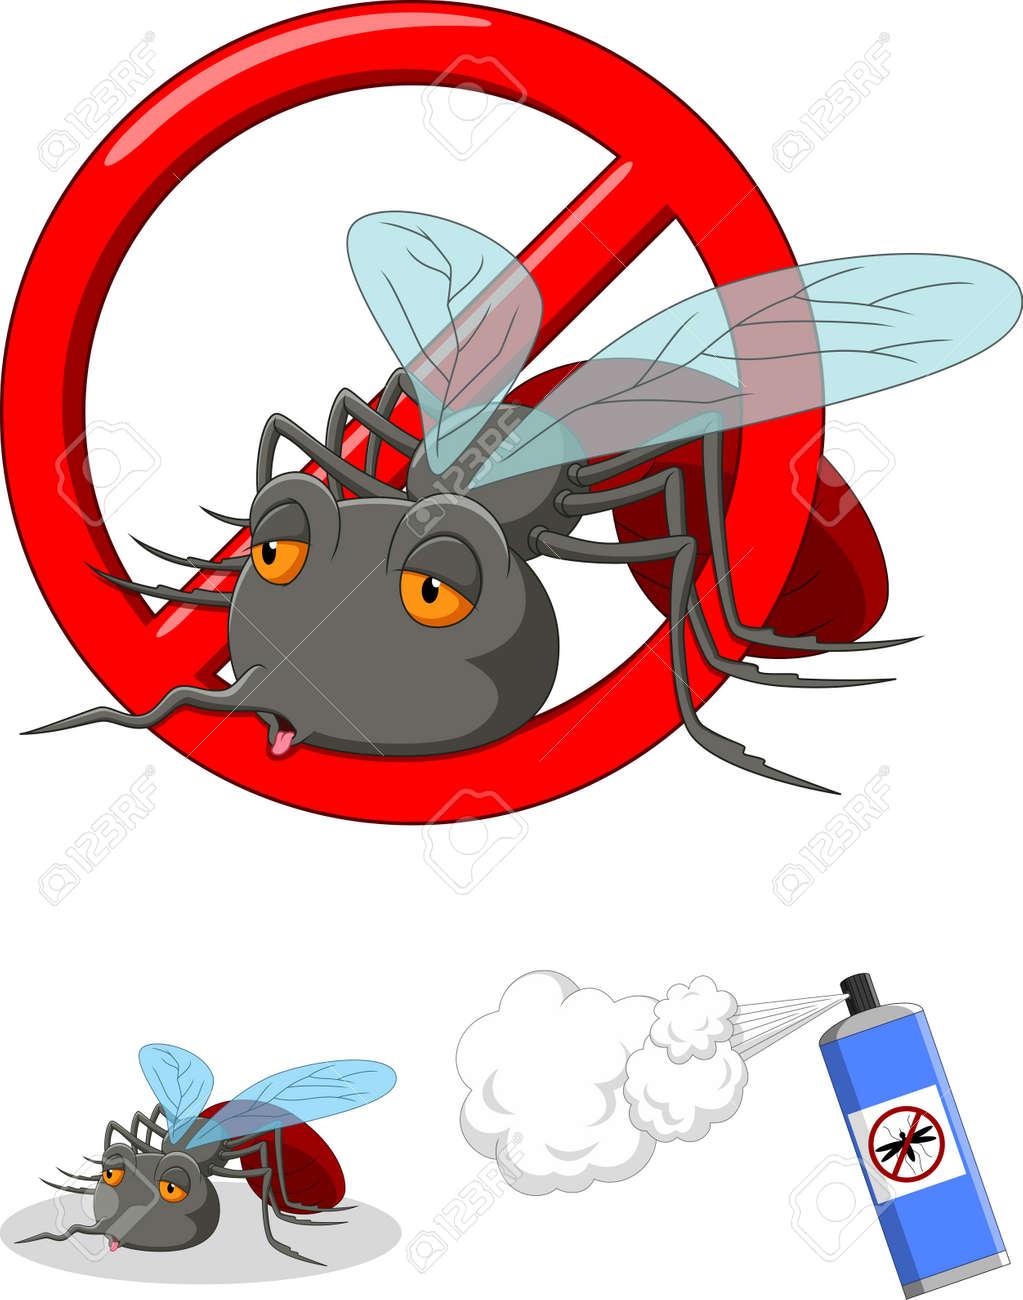 Stop mosquito cartoon - 165285560